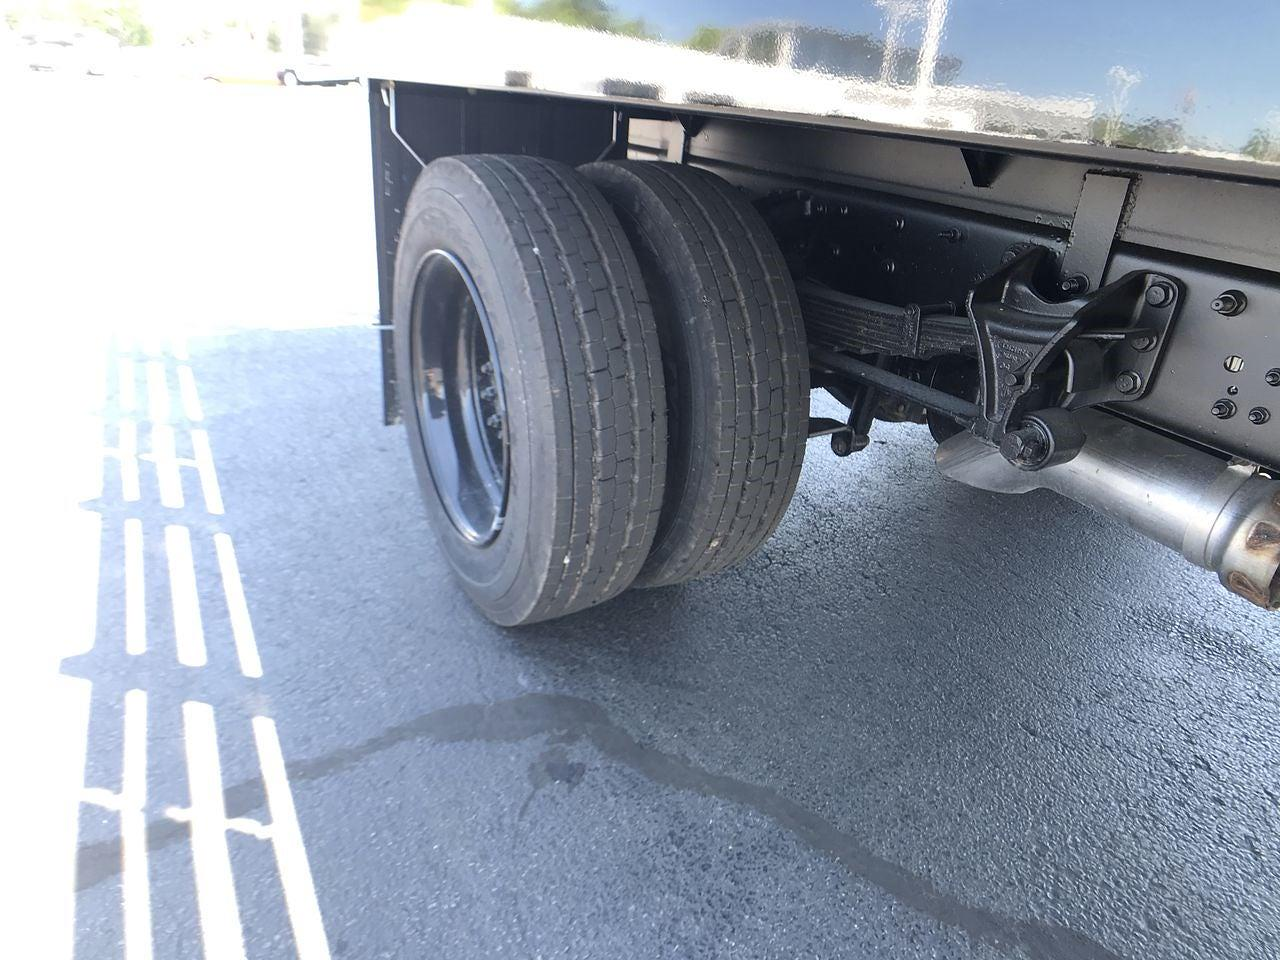 2020 Silverado 5500 Regular Cab DRW 4x2,  Monroe Truck Equipment AL Series Platform Body #111699 - photo 10